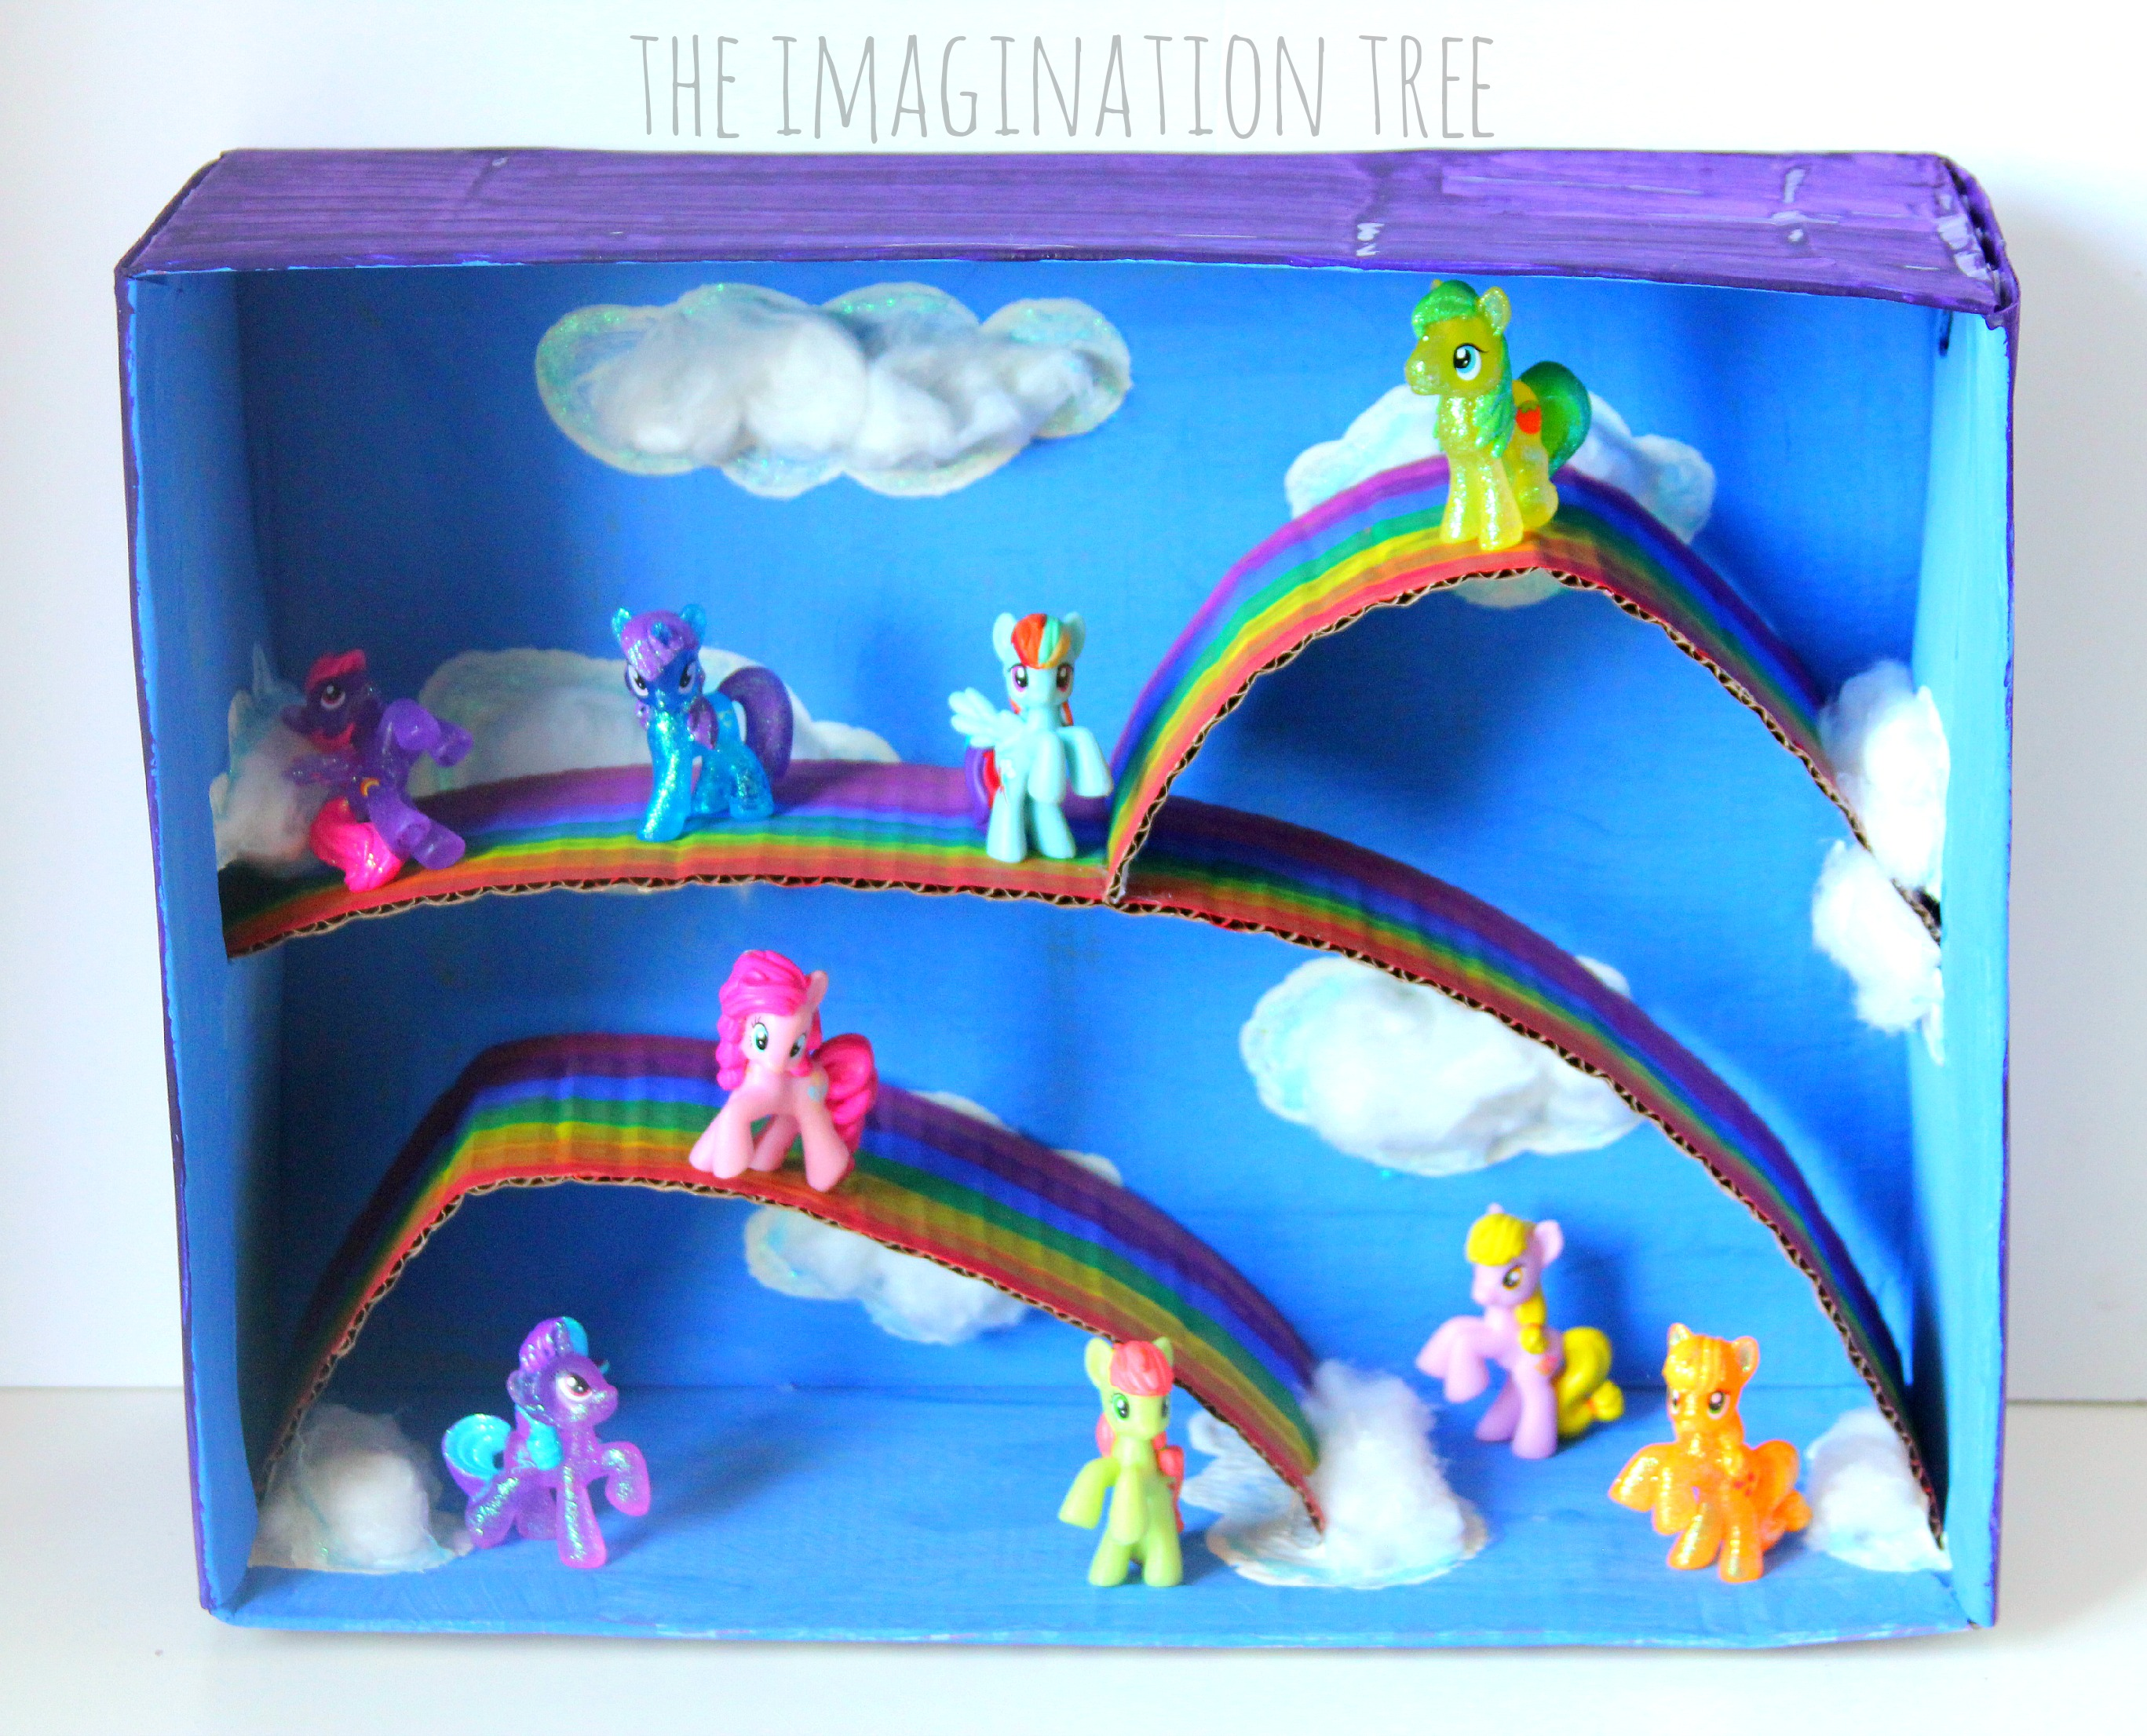 Drawn my little pony small Small World My Pony ideas